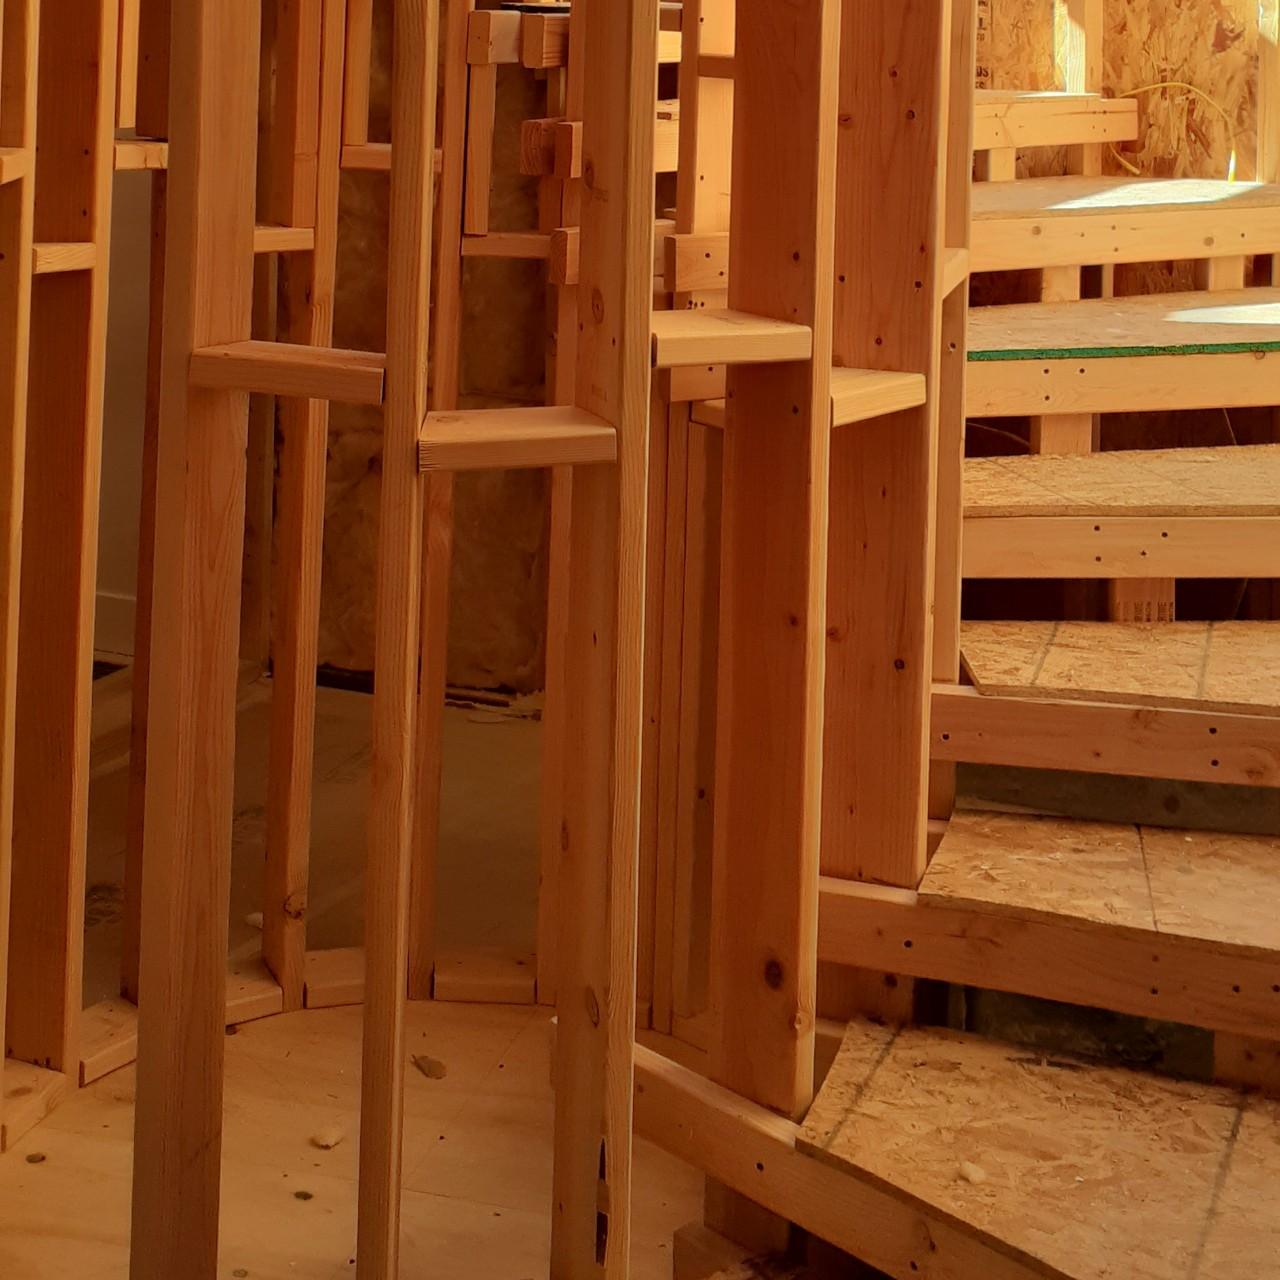 carpentry-wood-framing-second-floor-home-addition--framing-50